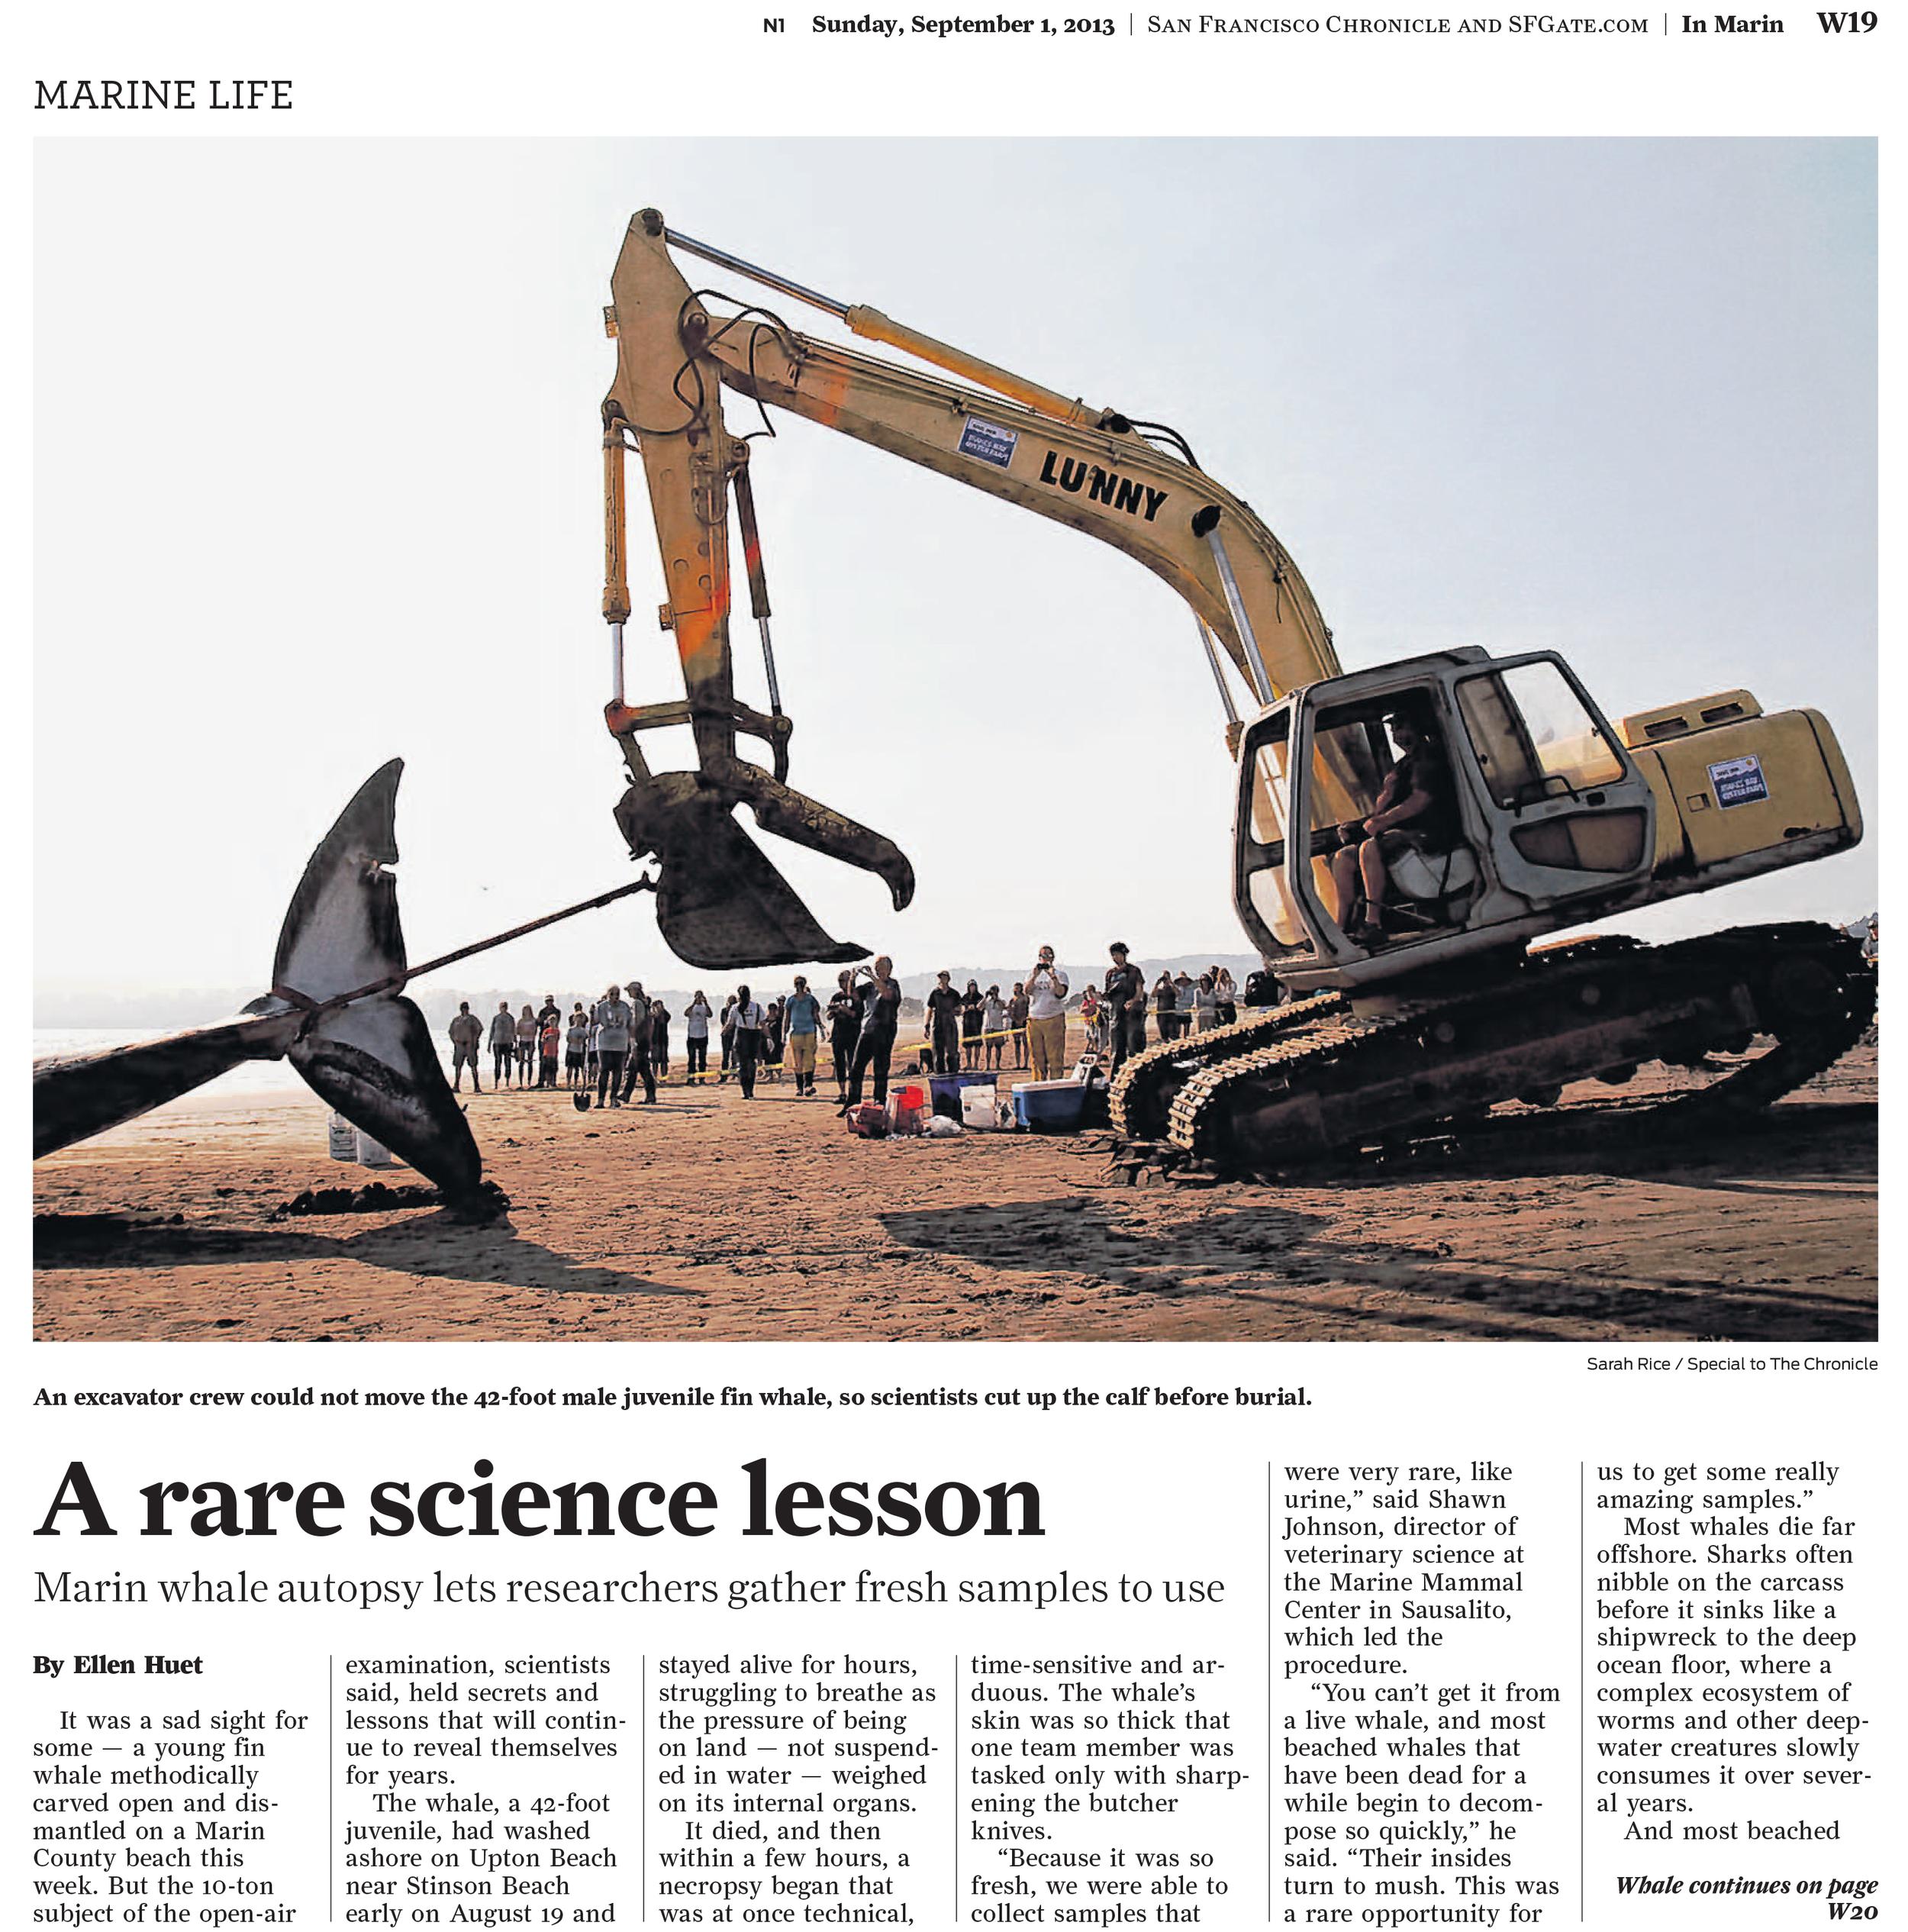 The San Francisco Chronicle and SFGate.com September 1, 2013 © San Francisco Chronicle